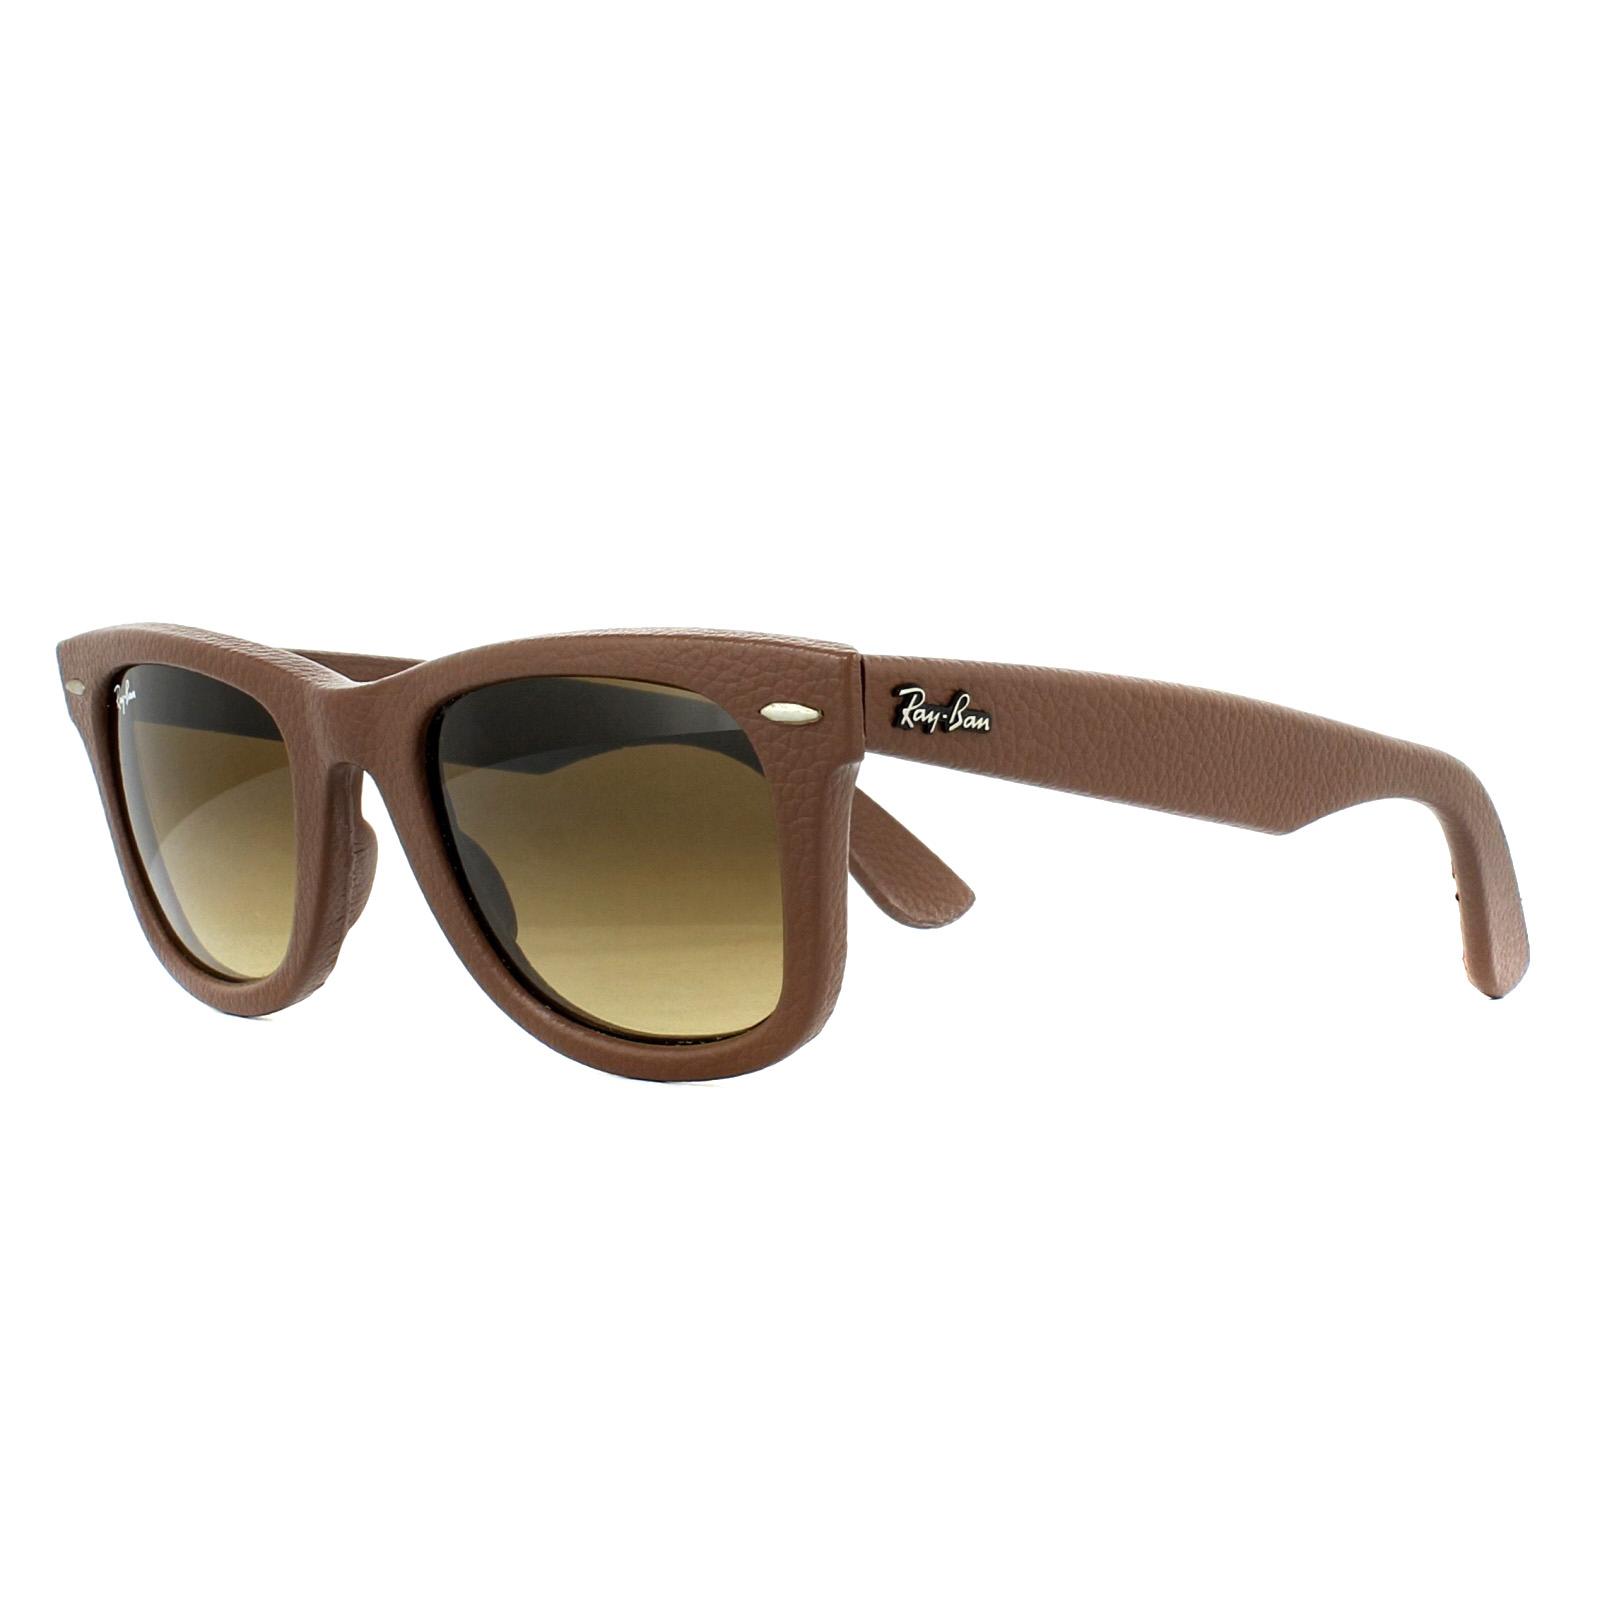 00d518bb32 CENTINELA Ray-Ban gafas de sol Wayfarer 2140QM 116985 bronce cobre cuero  marrón degradado M